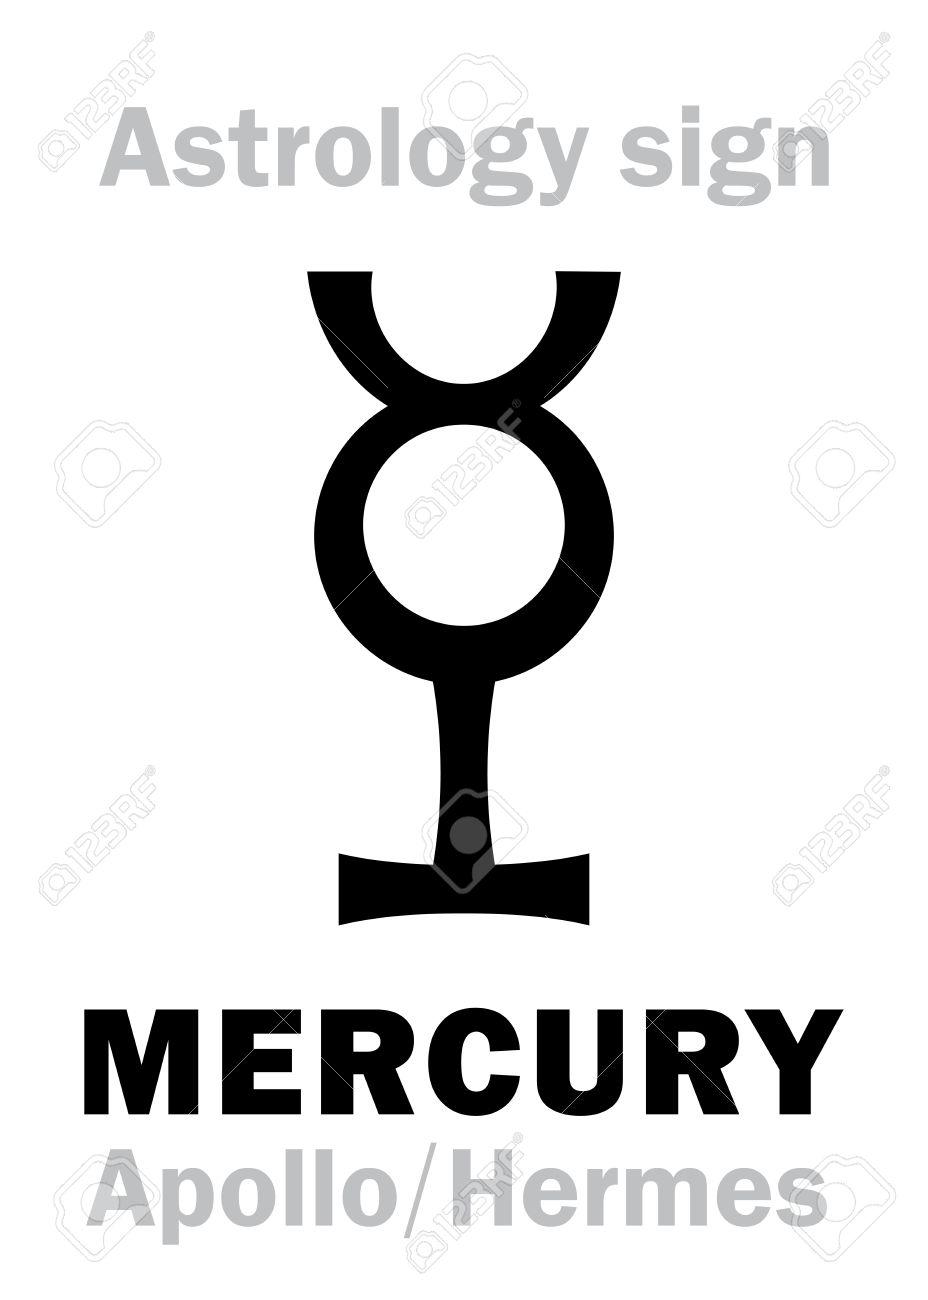 93 apollo god cliparts stock vector and royalty free apollo god astrology alphabet mercury apollo hermes the planetary star planet biocorpaavc